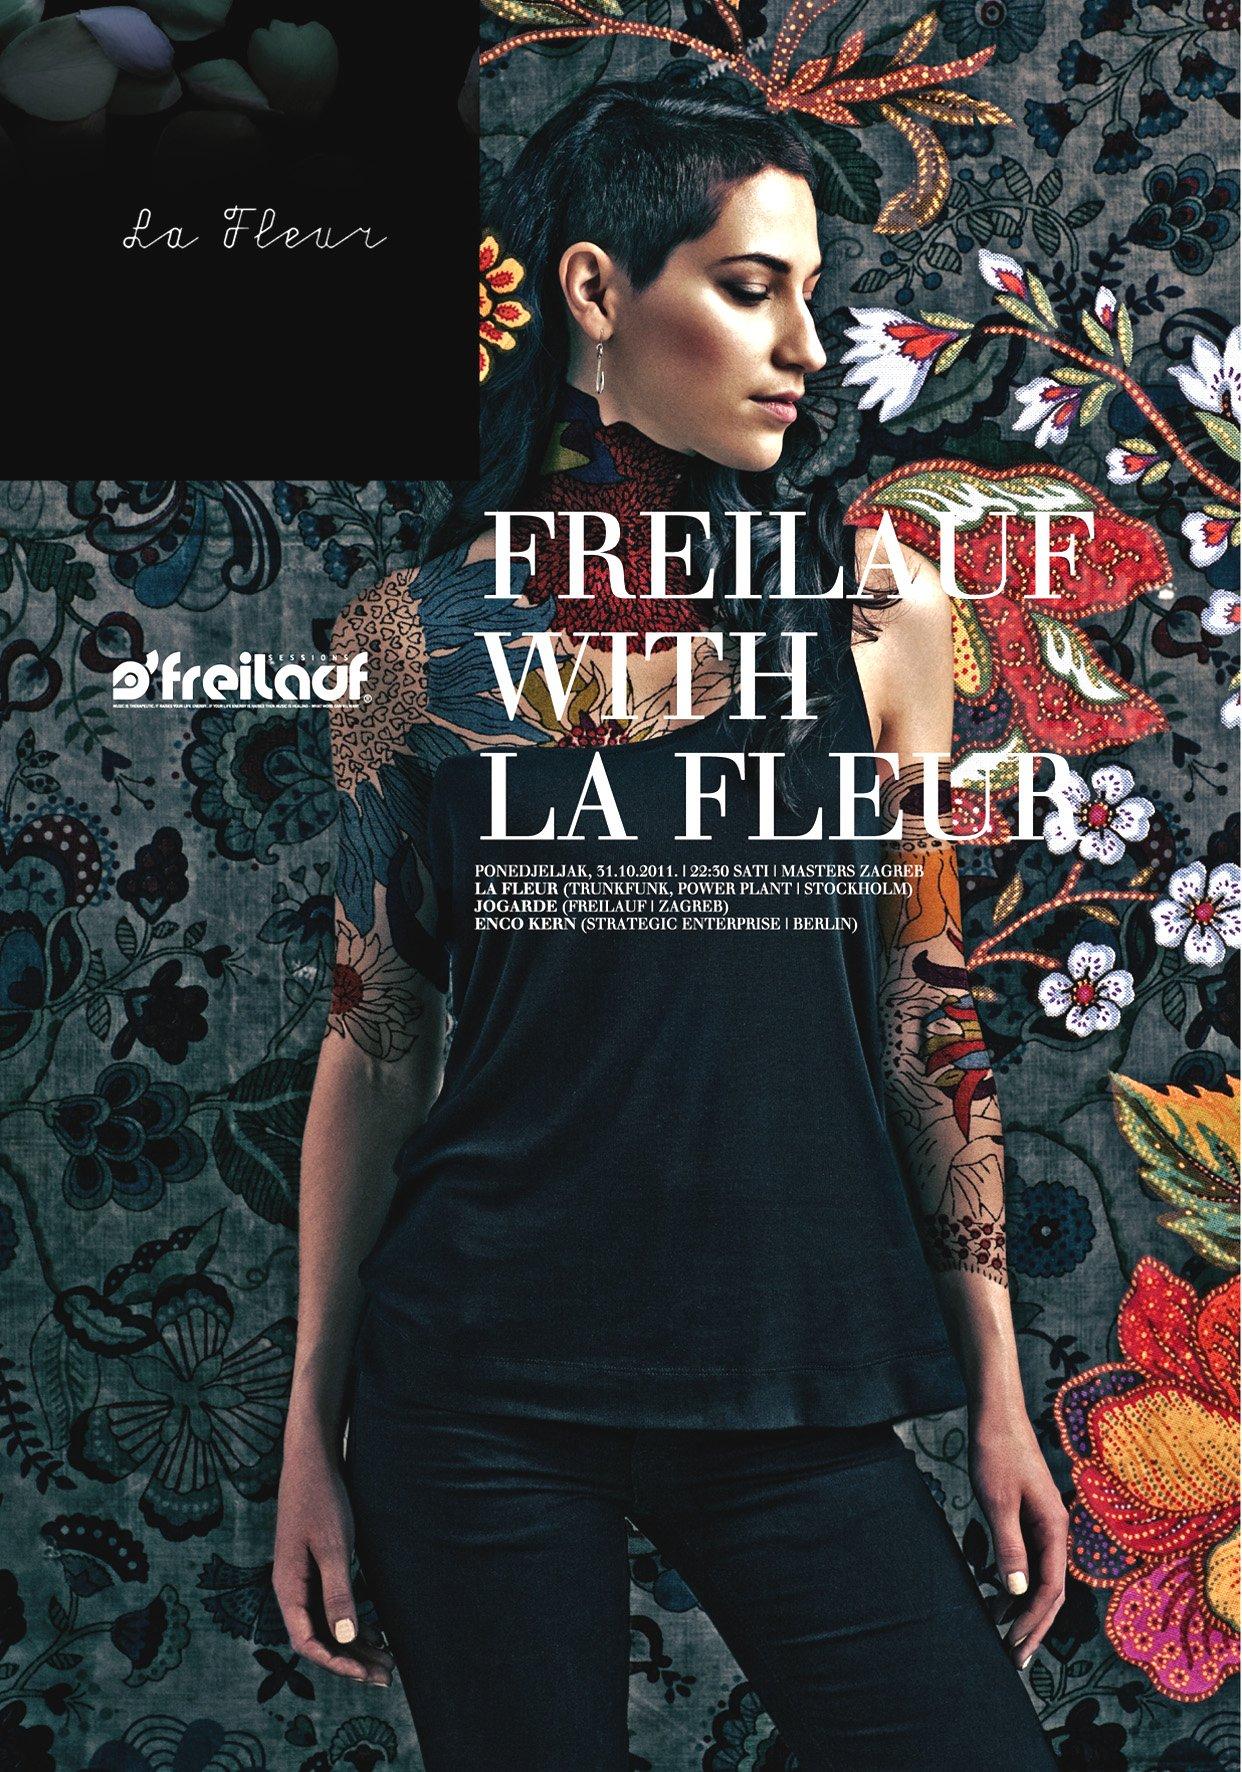 Freilauf with La Fleur - Flyer front